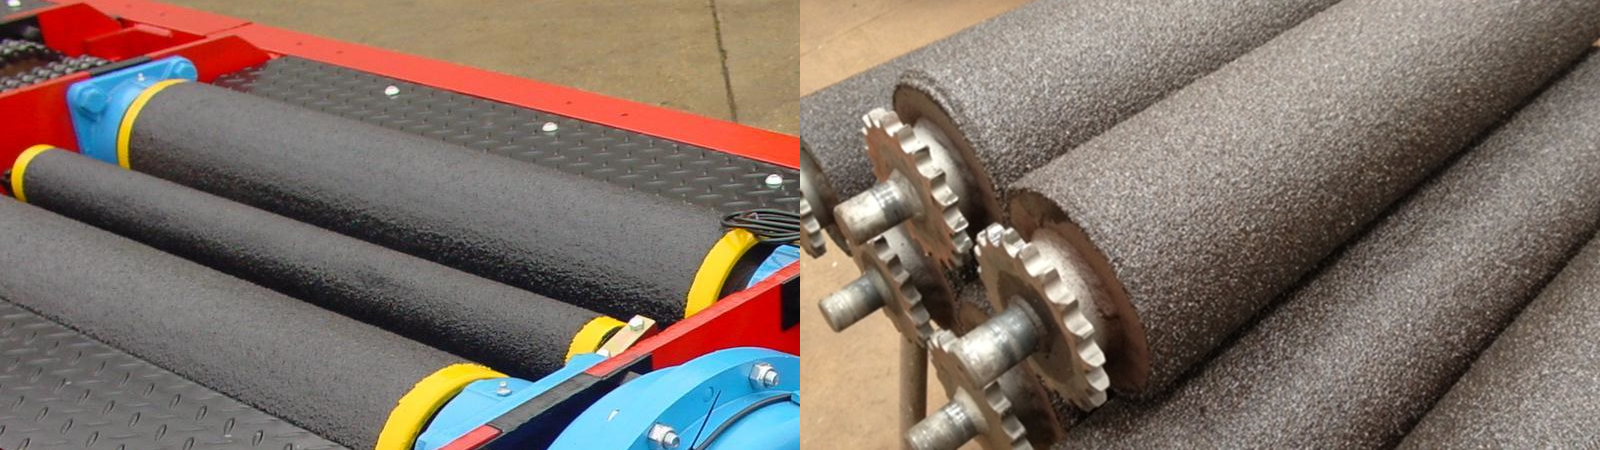 Brake Tester Rollers